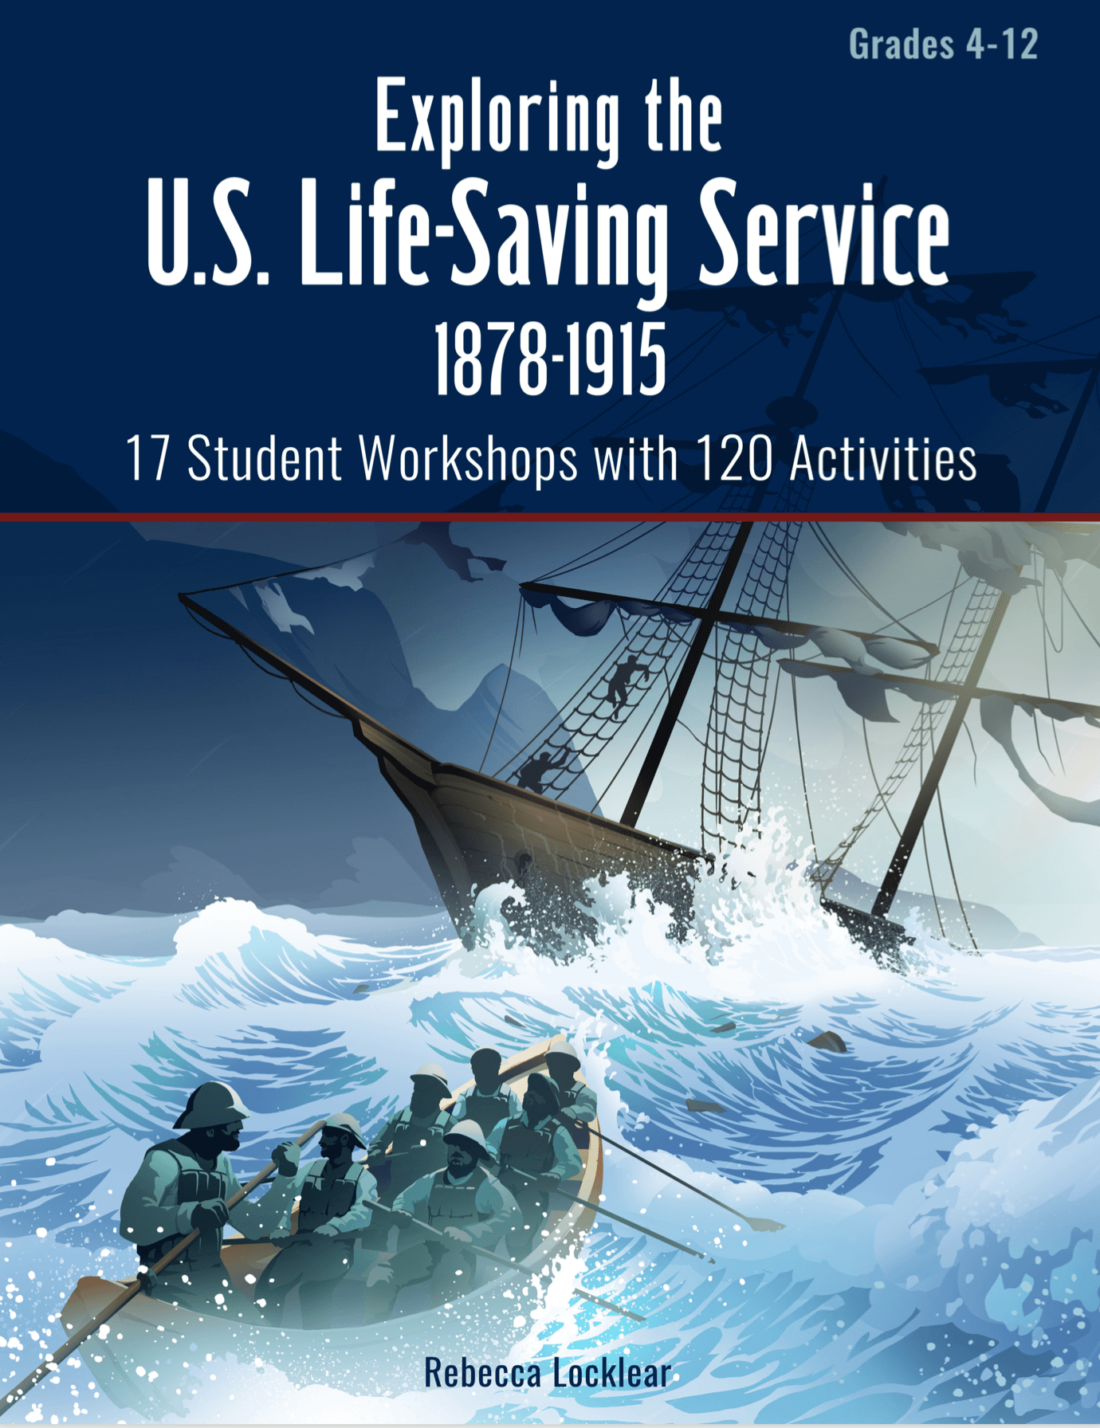 U.S. Life-Saving-Service Coast Guard Military